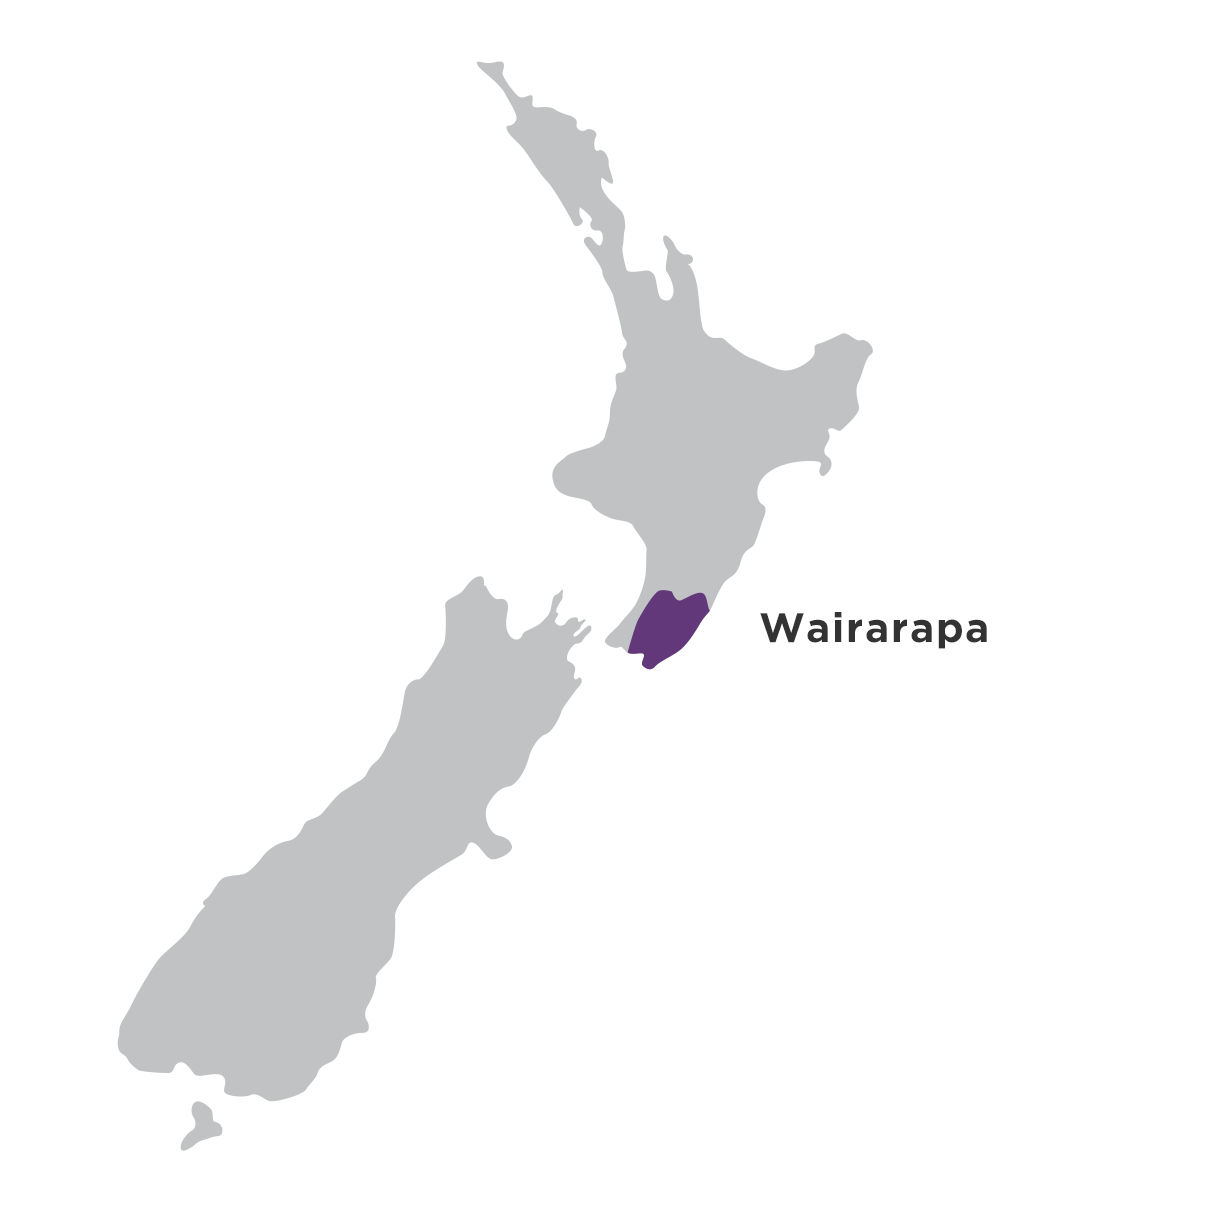 Wairarapa